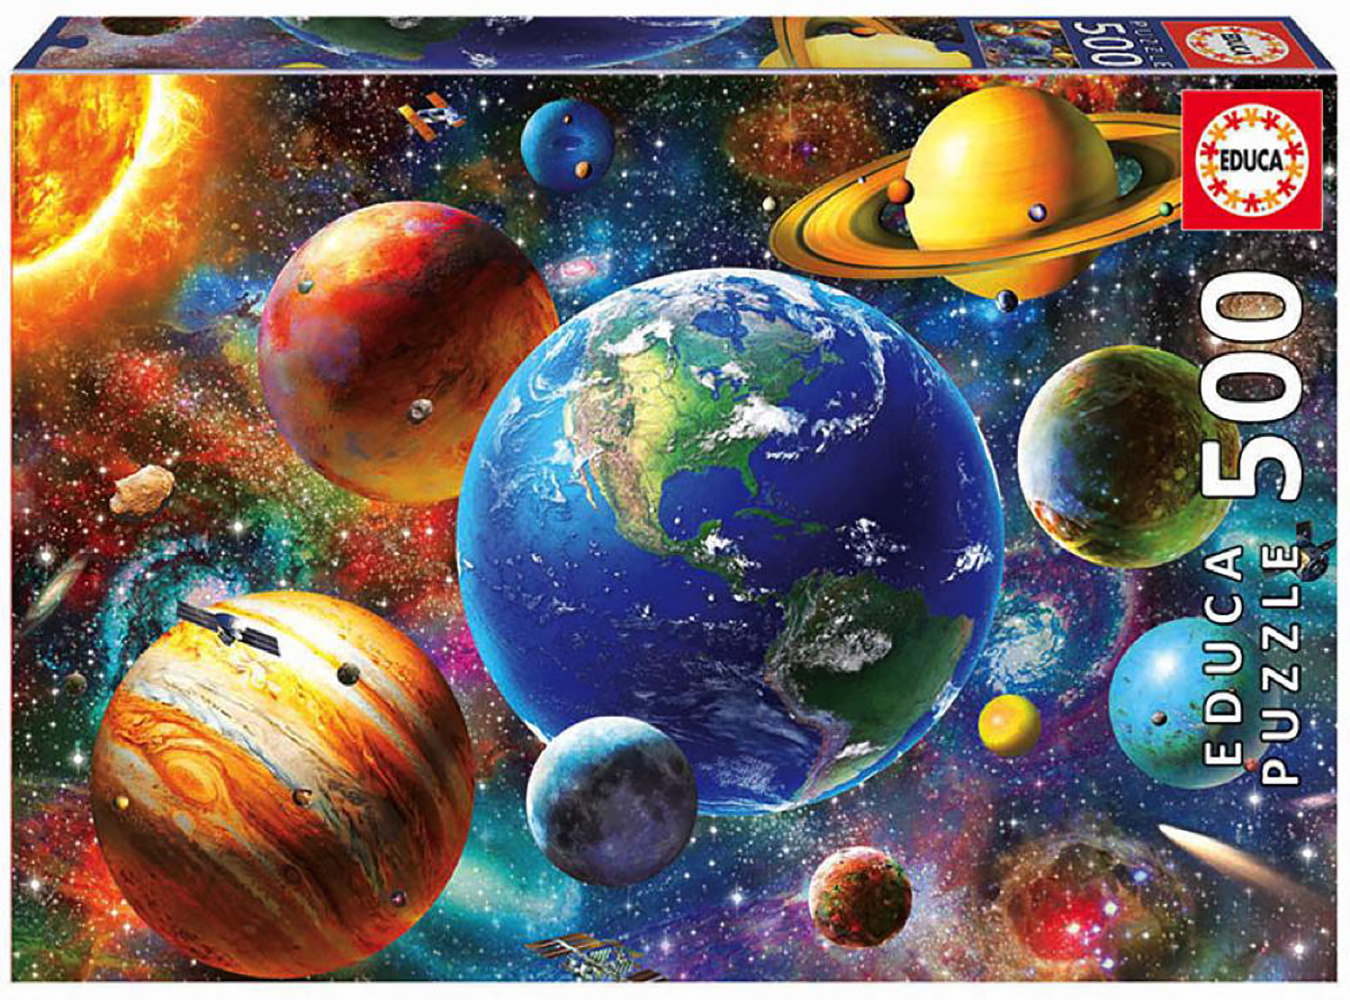 500 pieces puzzle - Solar system